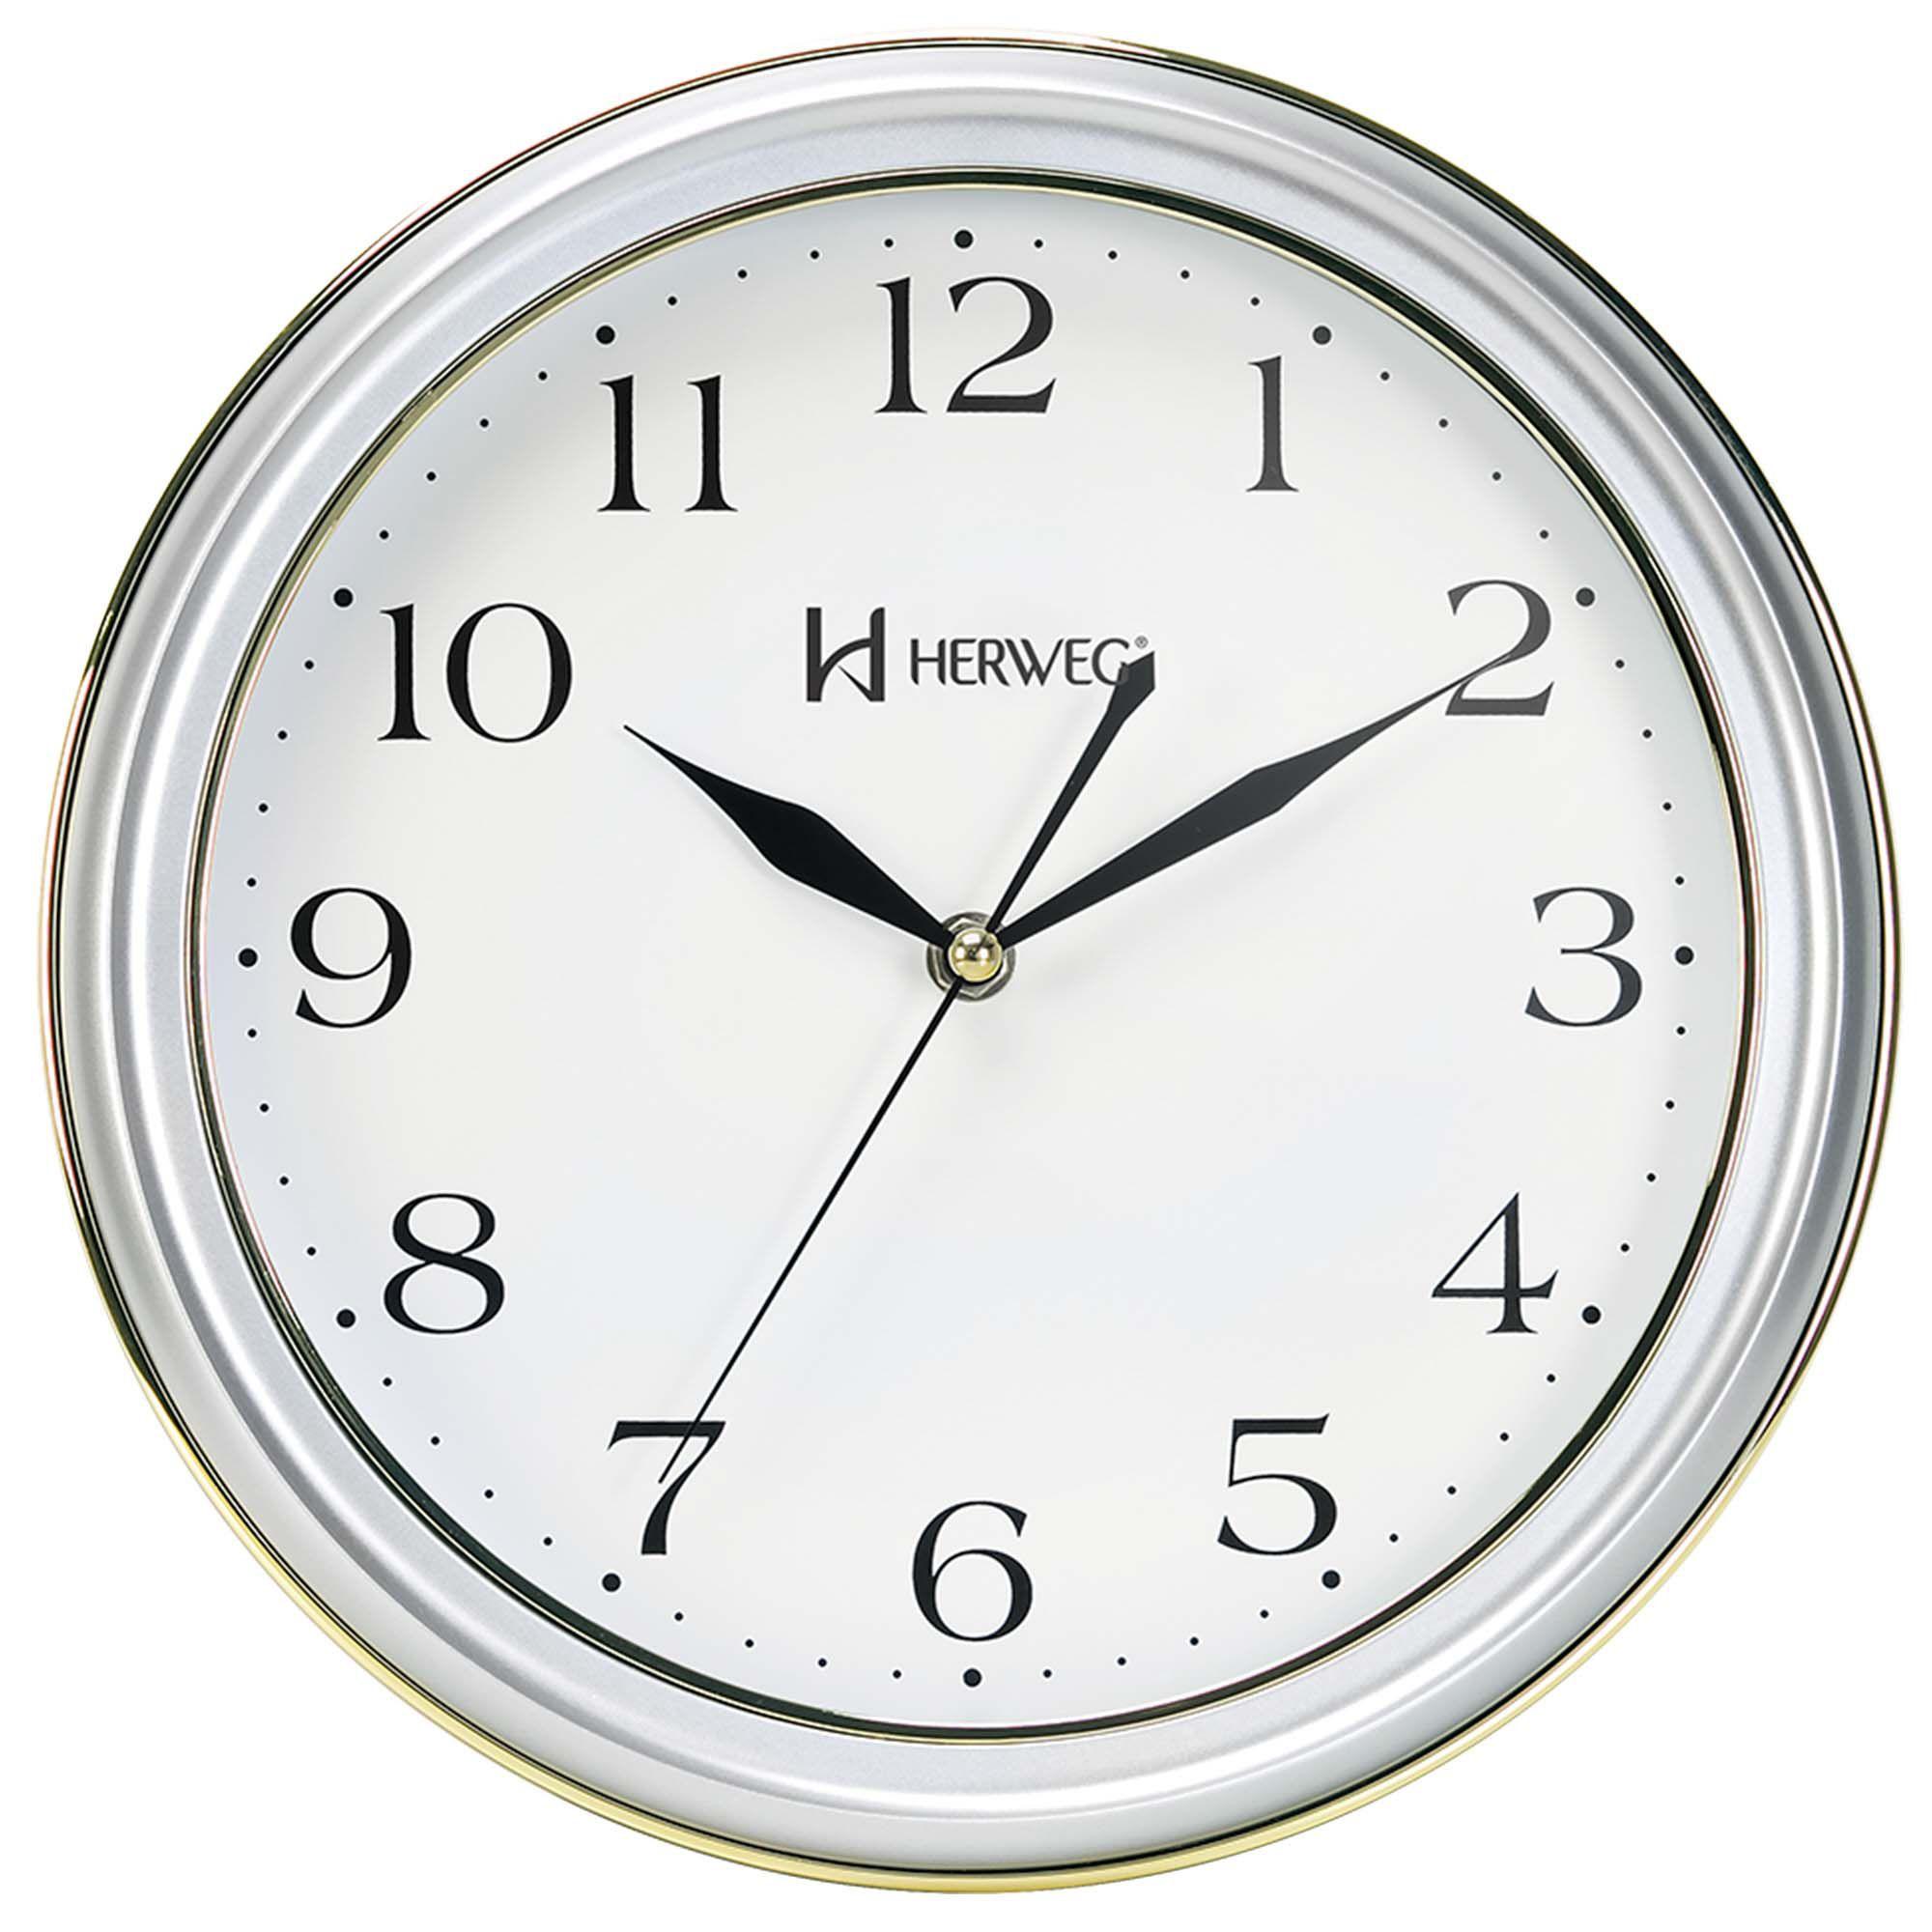 Relógio de Parede Analógico Herweg 6254 070 Prata Metálico